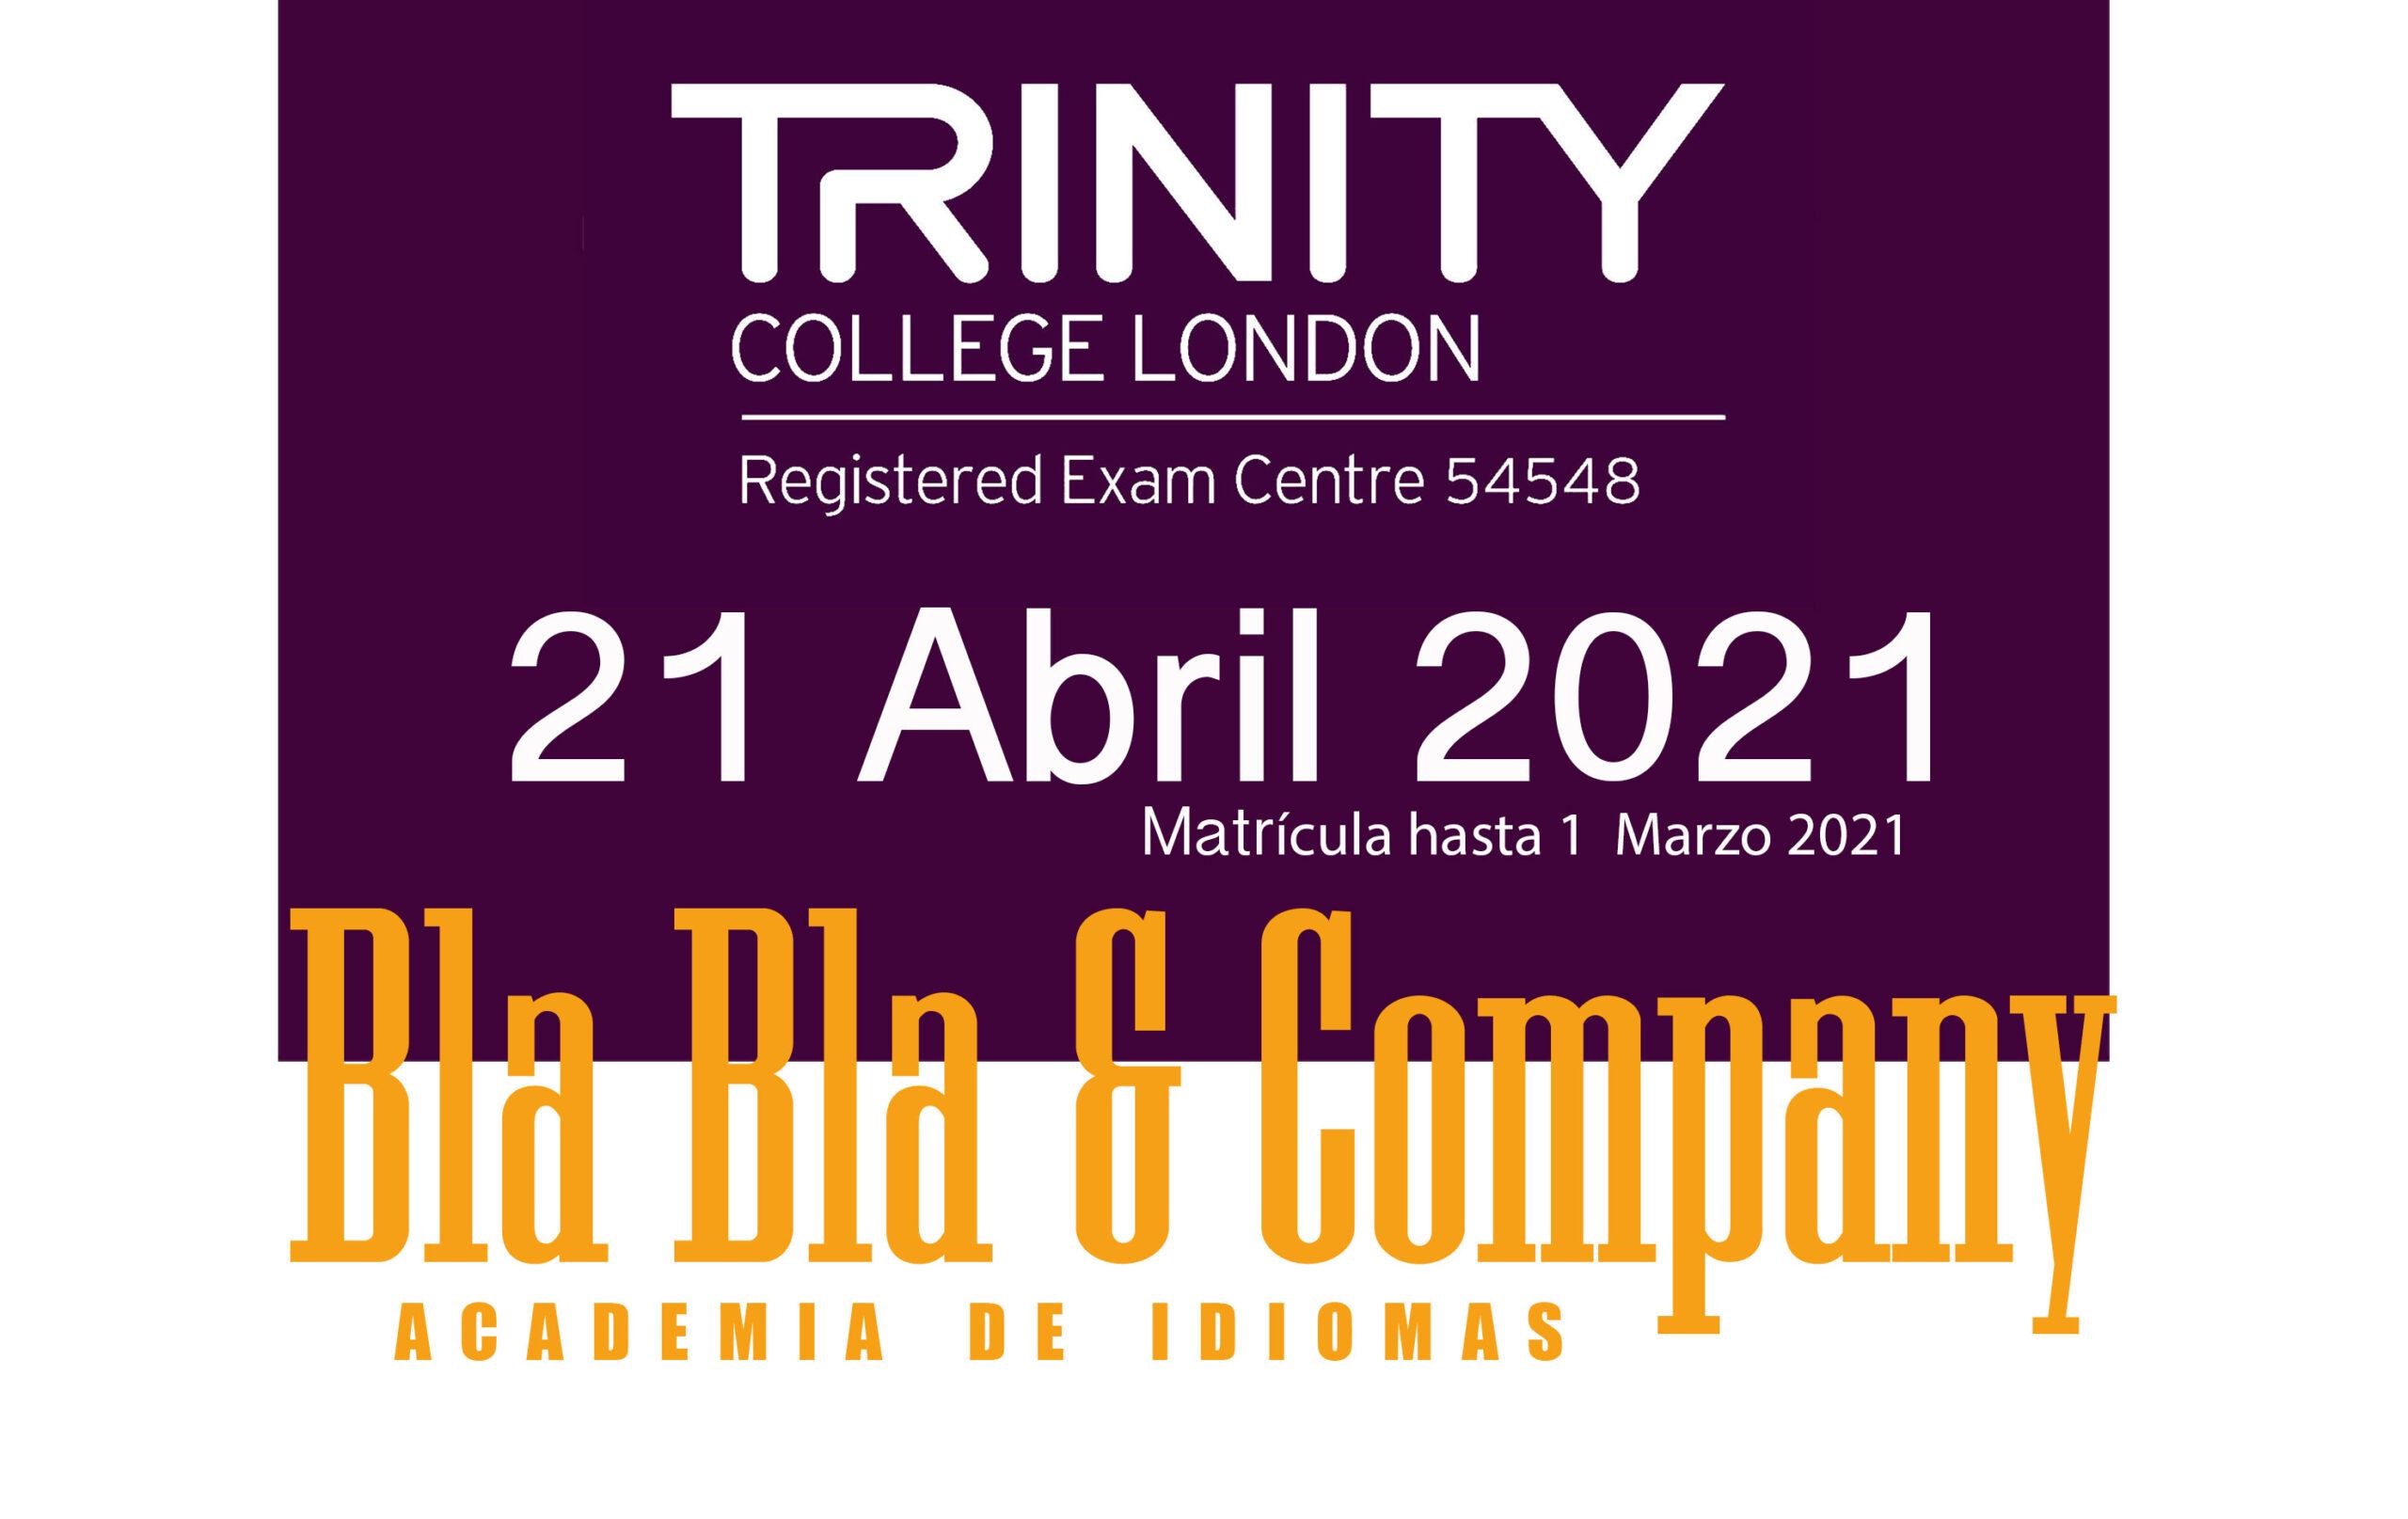 Examen Trinity Diciembre 2020